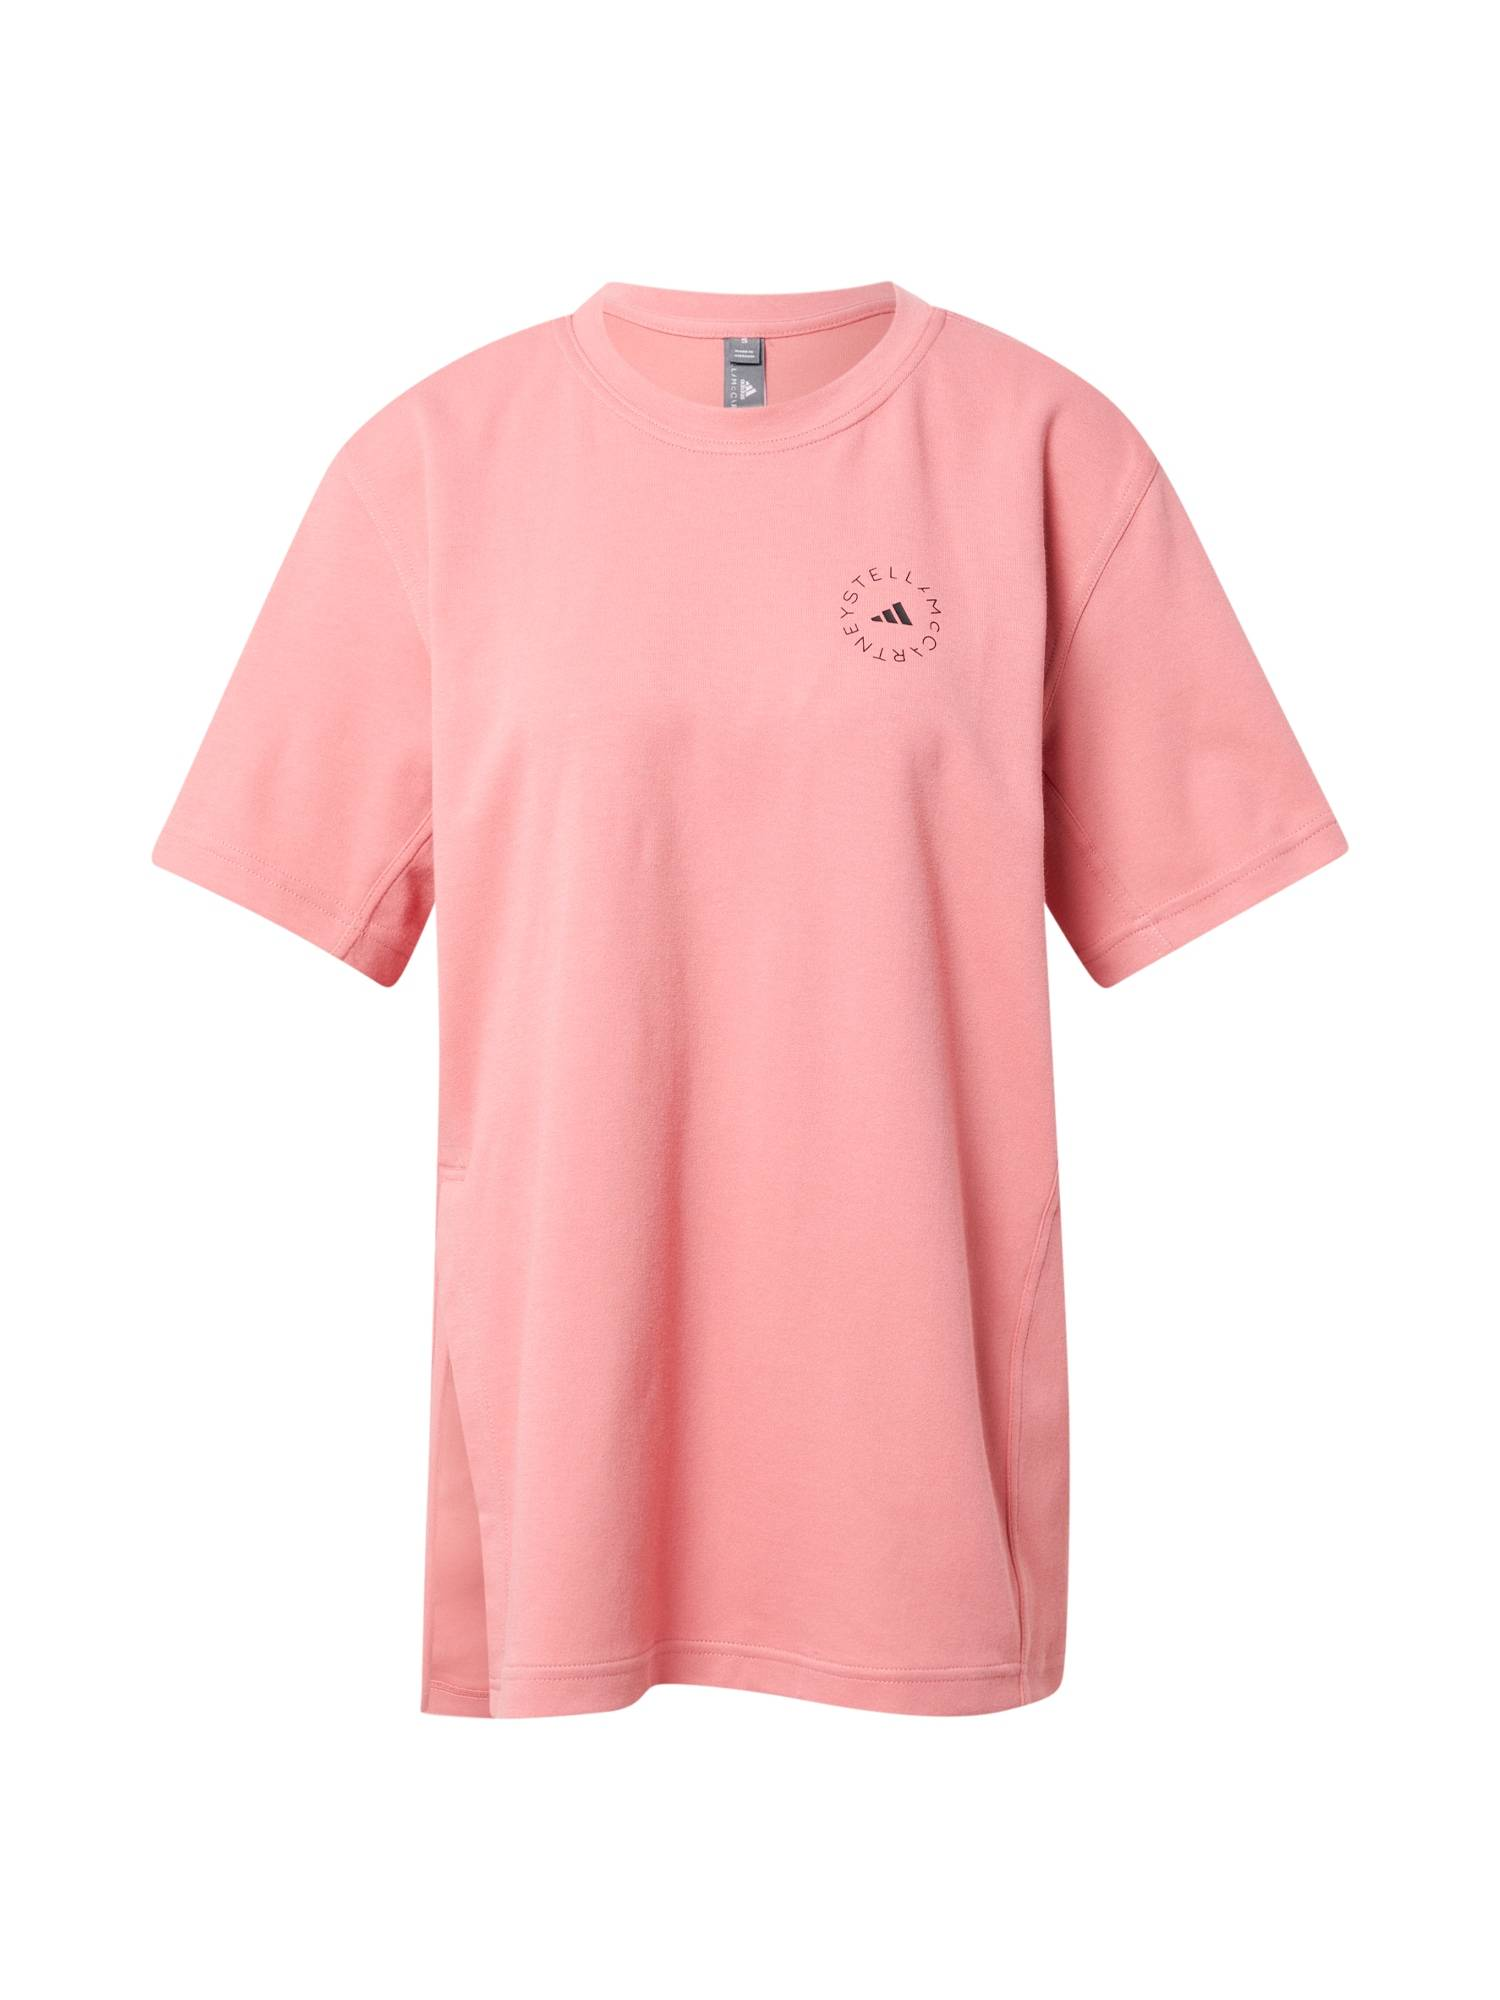 adidas by stella mccartney maglia funzionale rosa